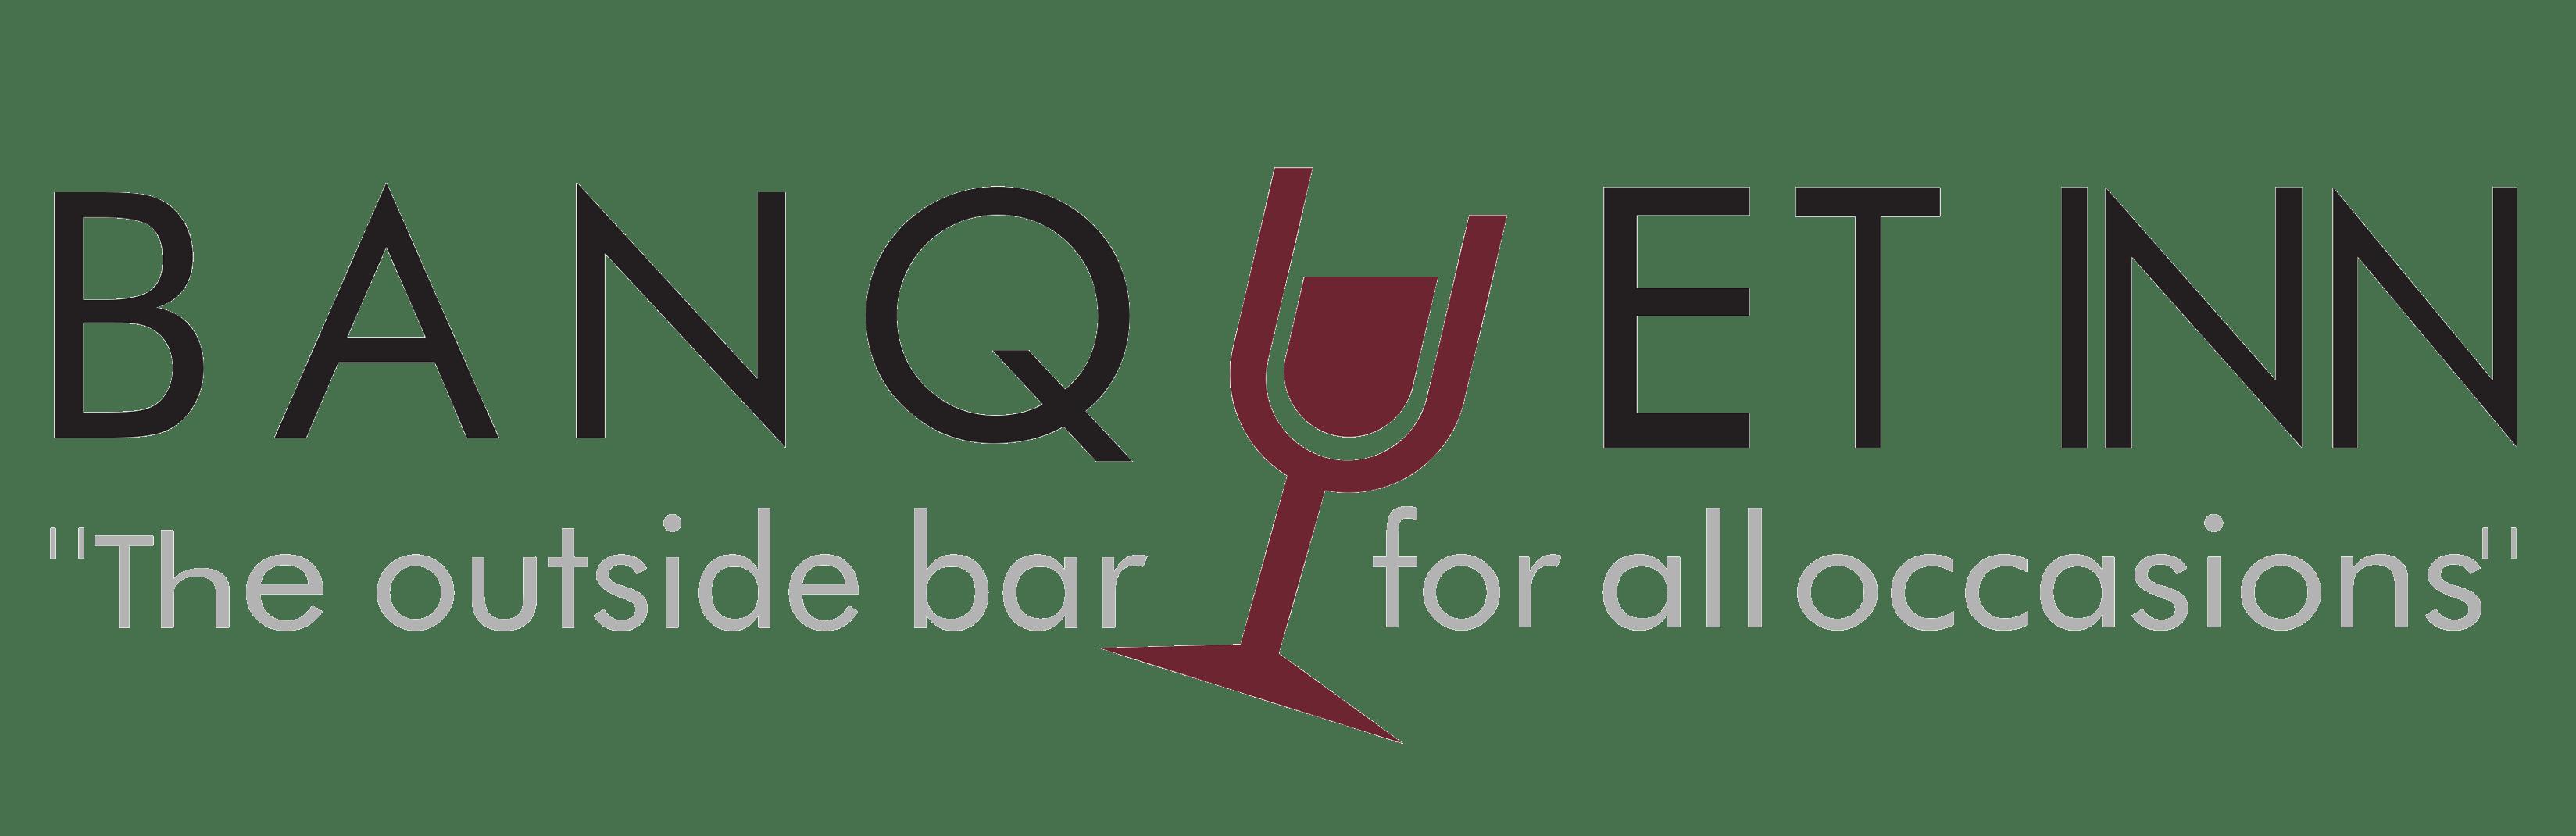 Banquet Inn Logo